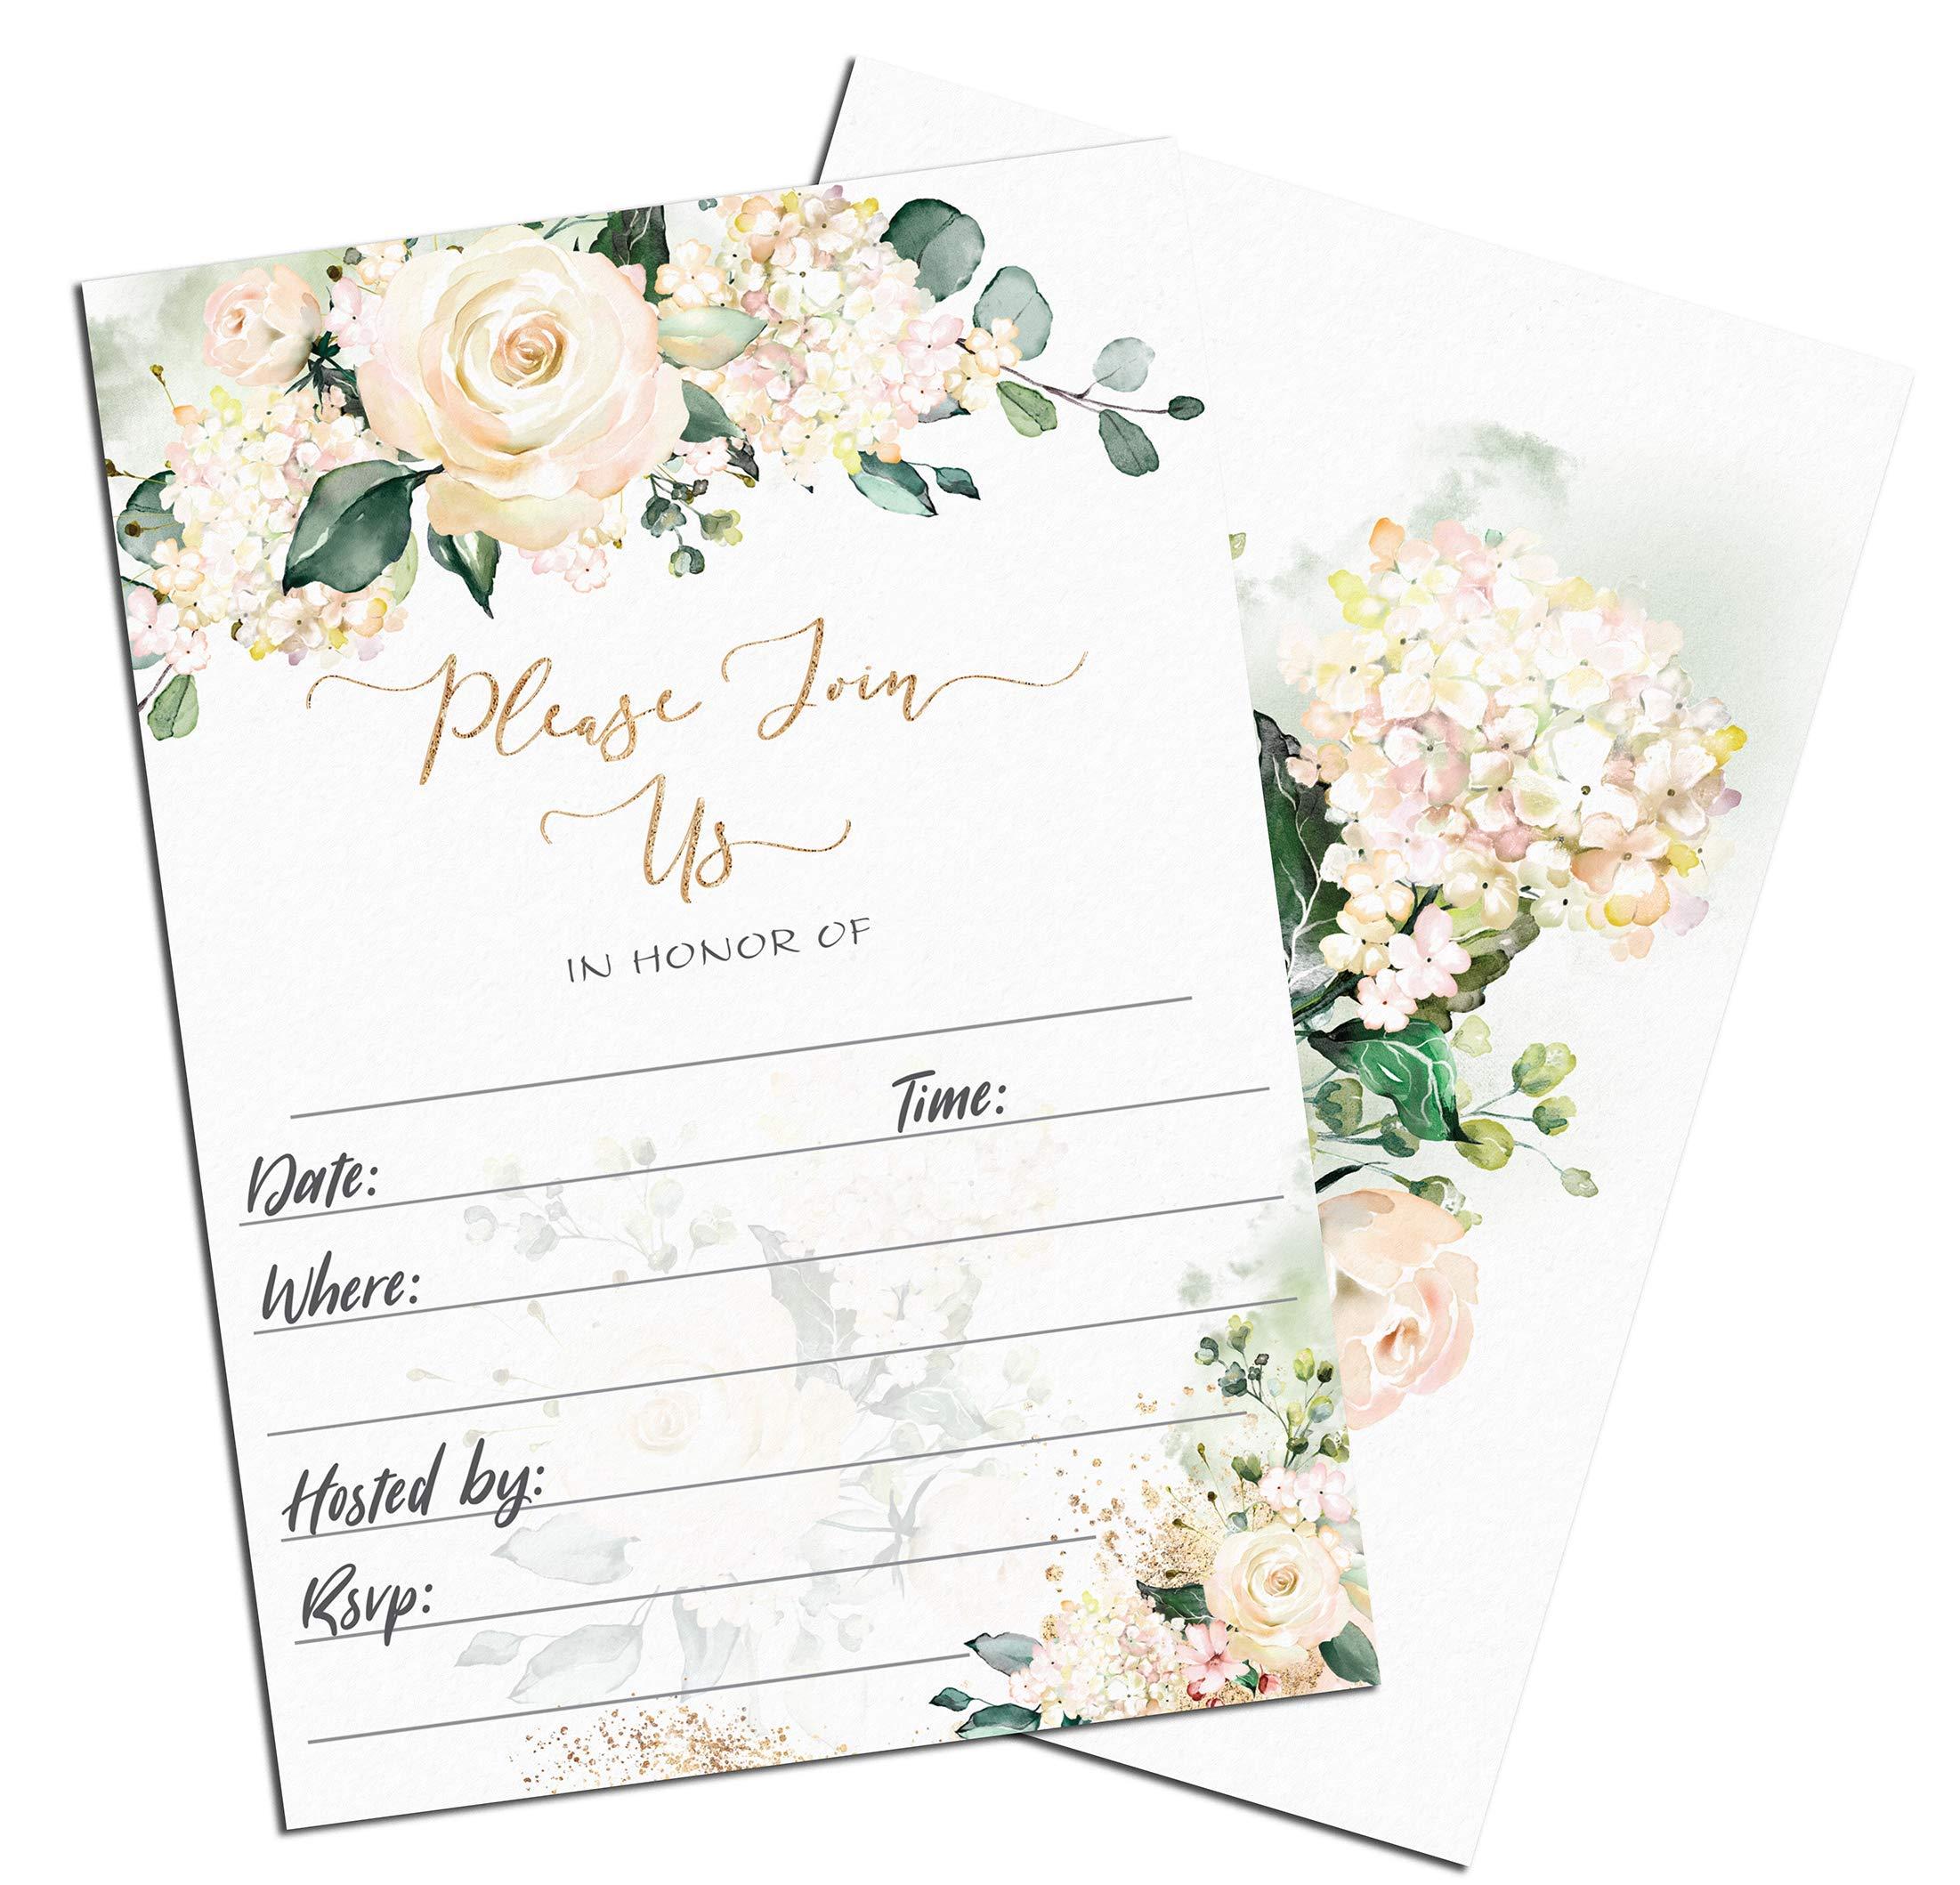 50 Sugar Vibes Linen Cardstock Invitations with Envelopes, Party Invitations with Envelopes, Birthday Invites, Shower Invitations, Gender Reveal Invitations, Invitations Cards